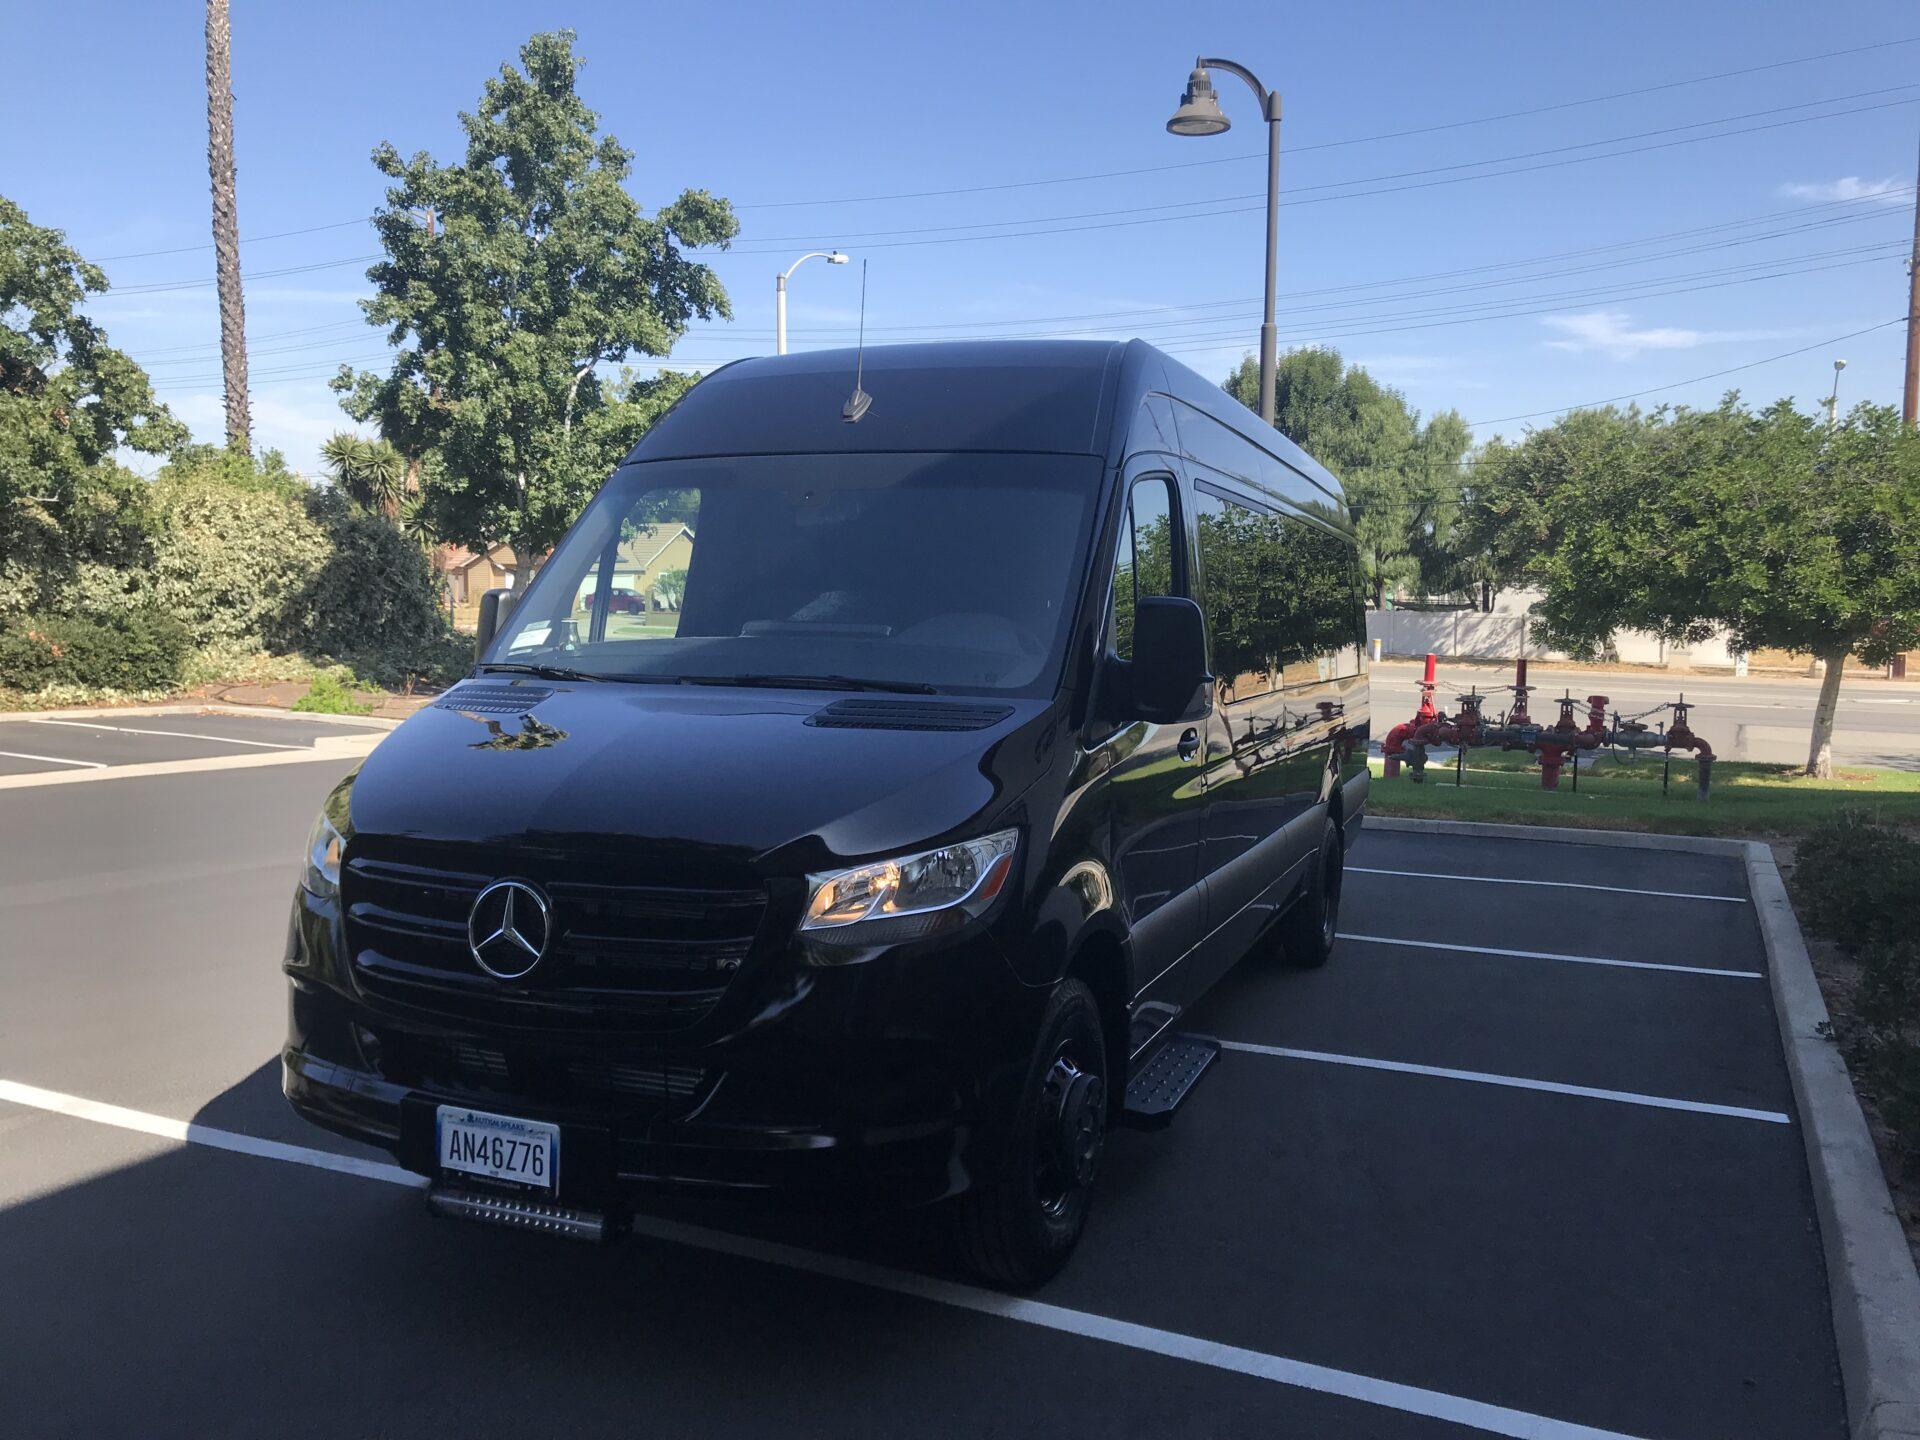 2019 Mercedes Benz Sprinter Passenger Van